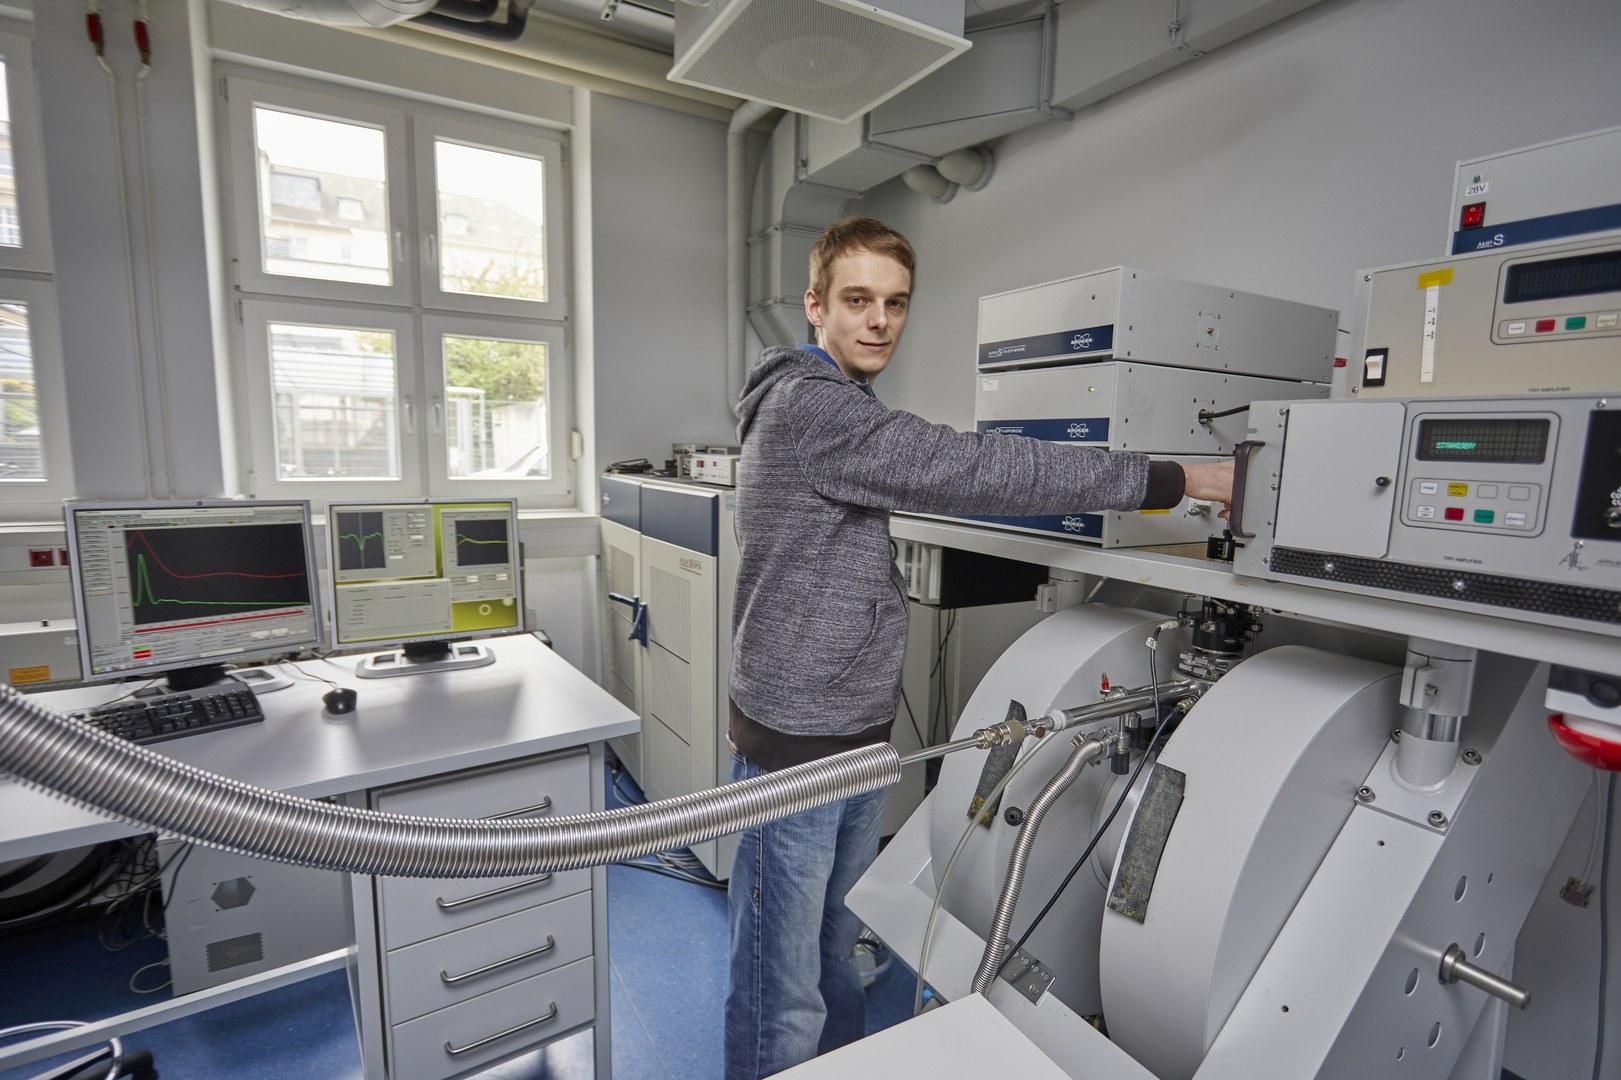 Tobias Hett, one of the authors of the study,